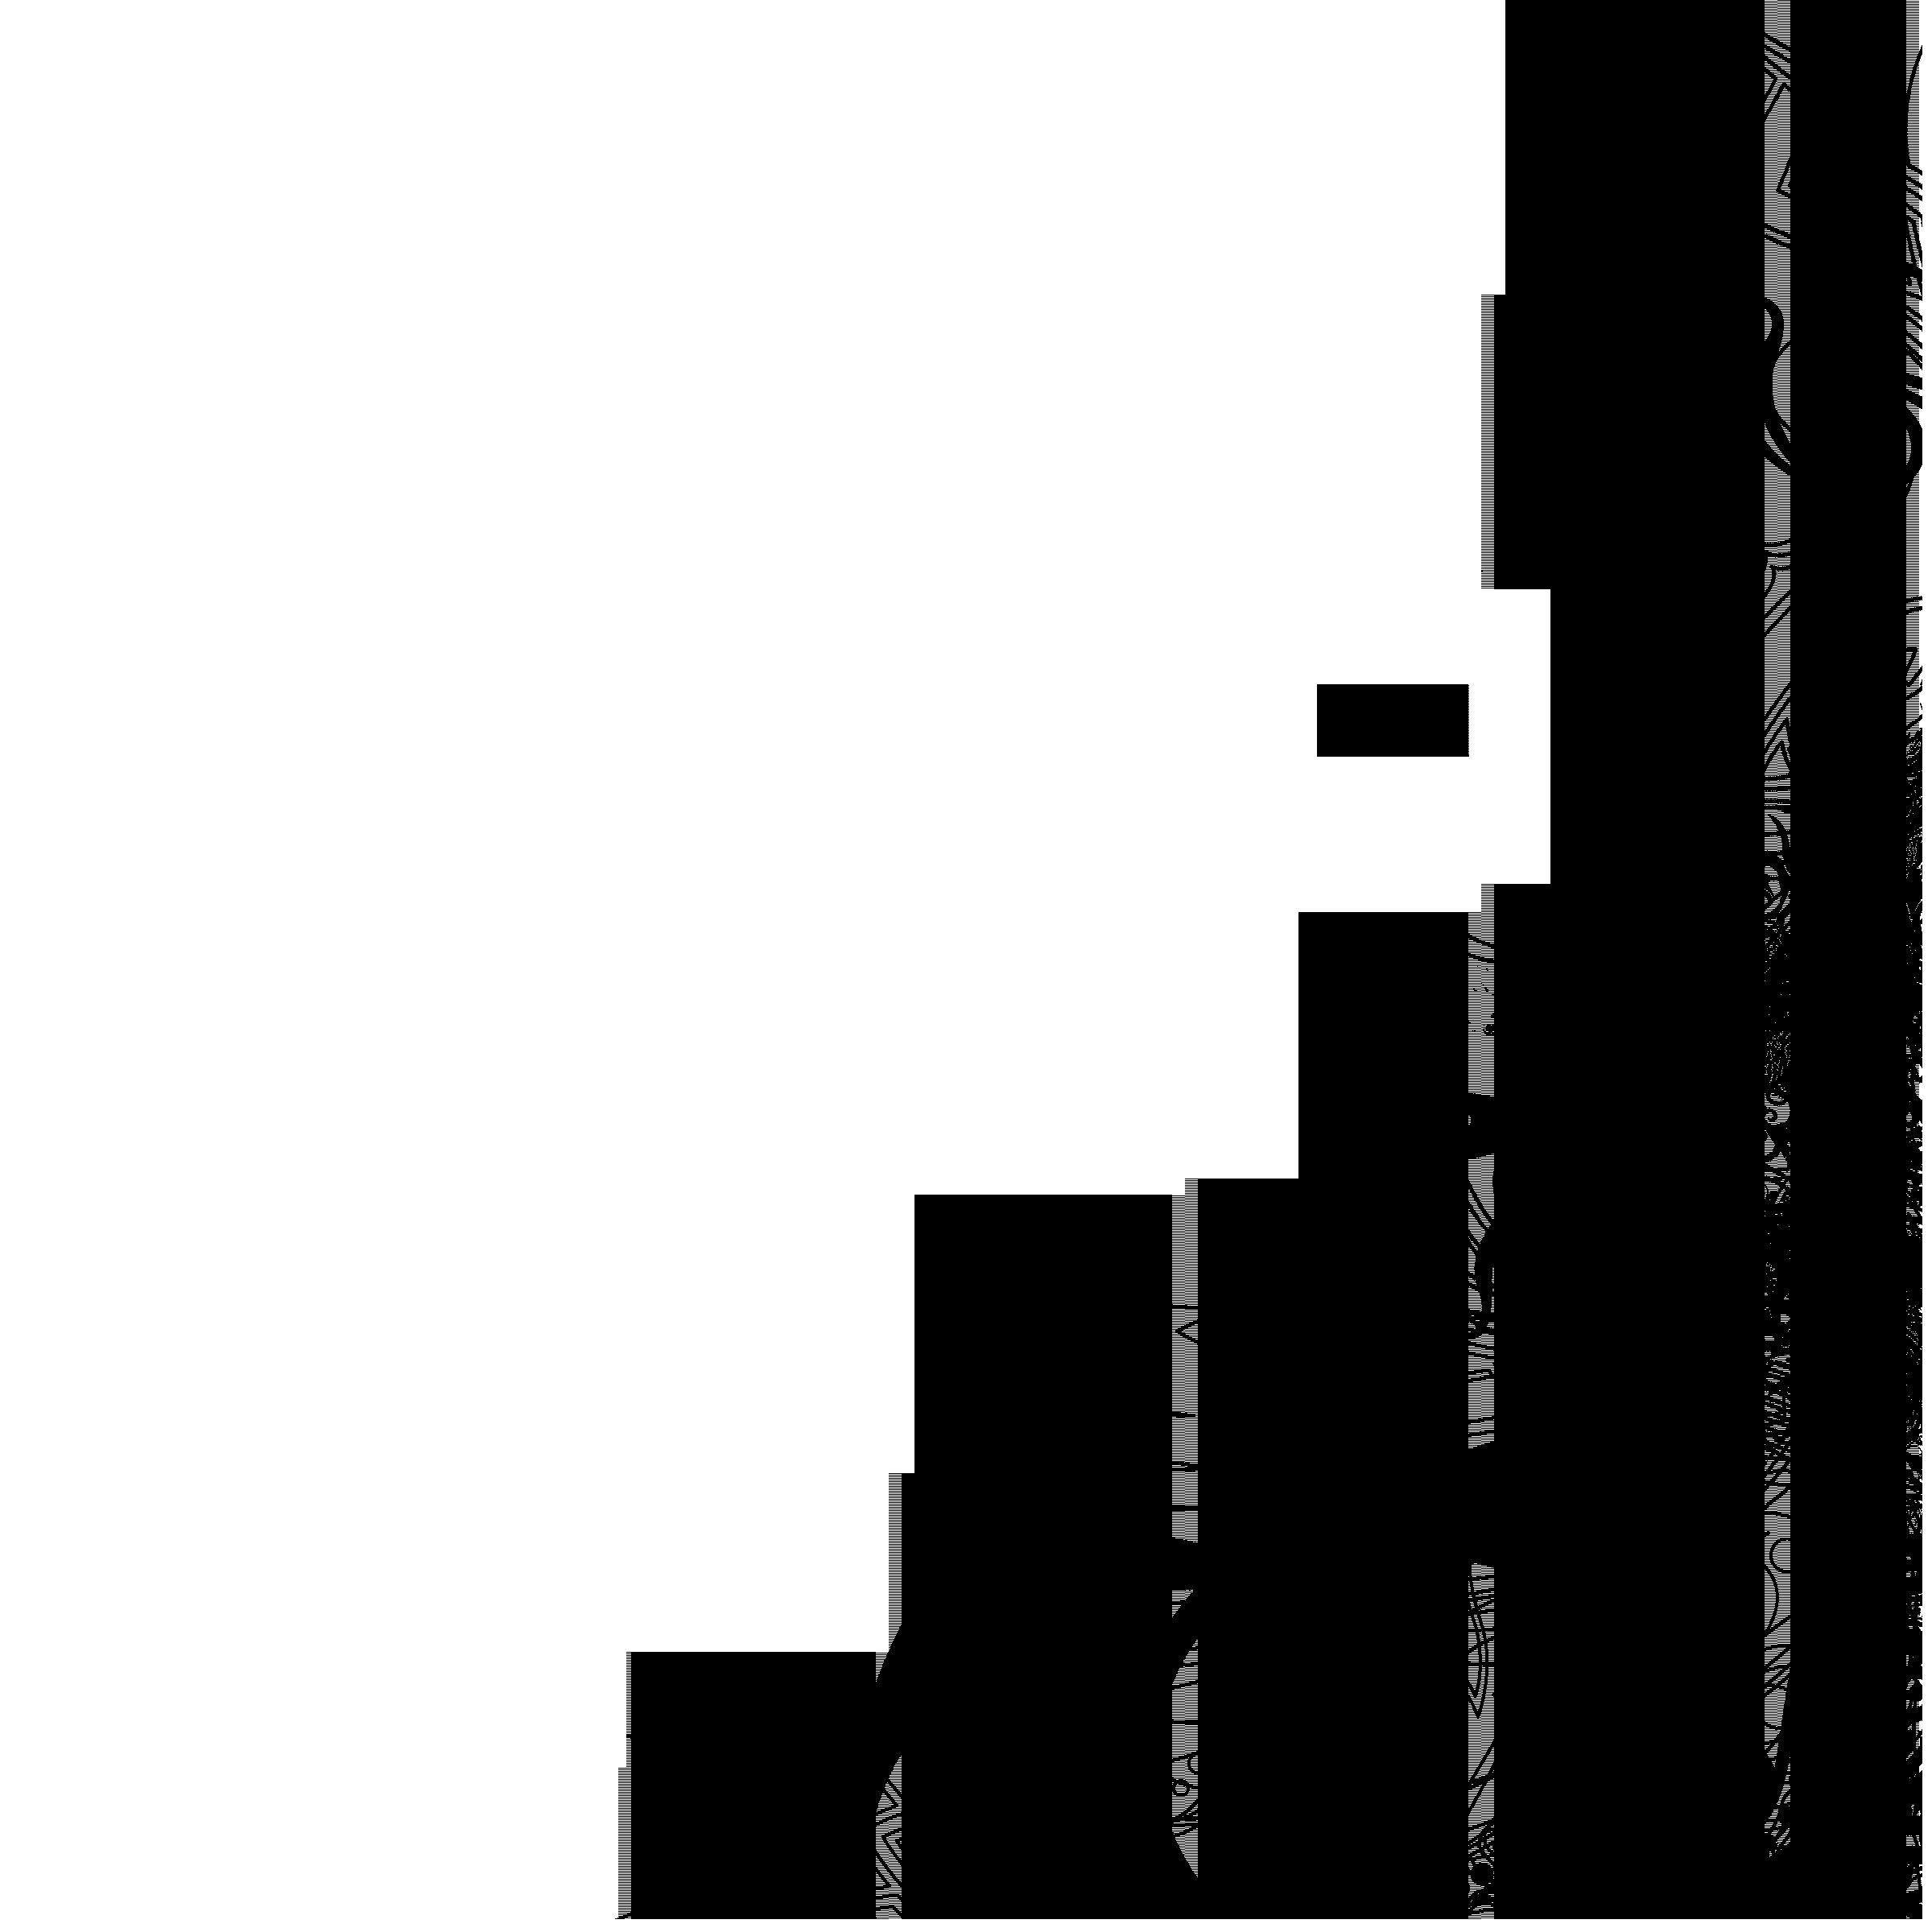 png高清边框素材14  png透明背景素材_png免抠图透明素材,png透明背景